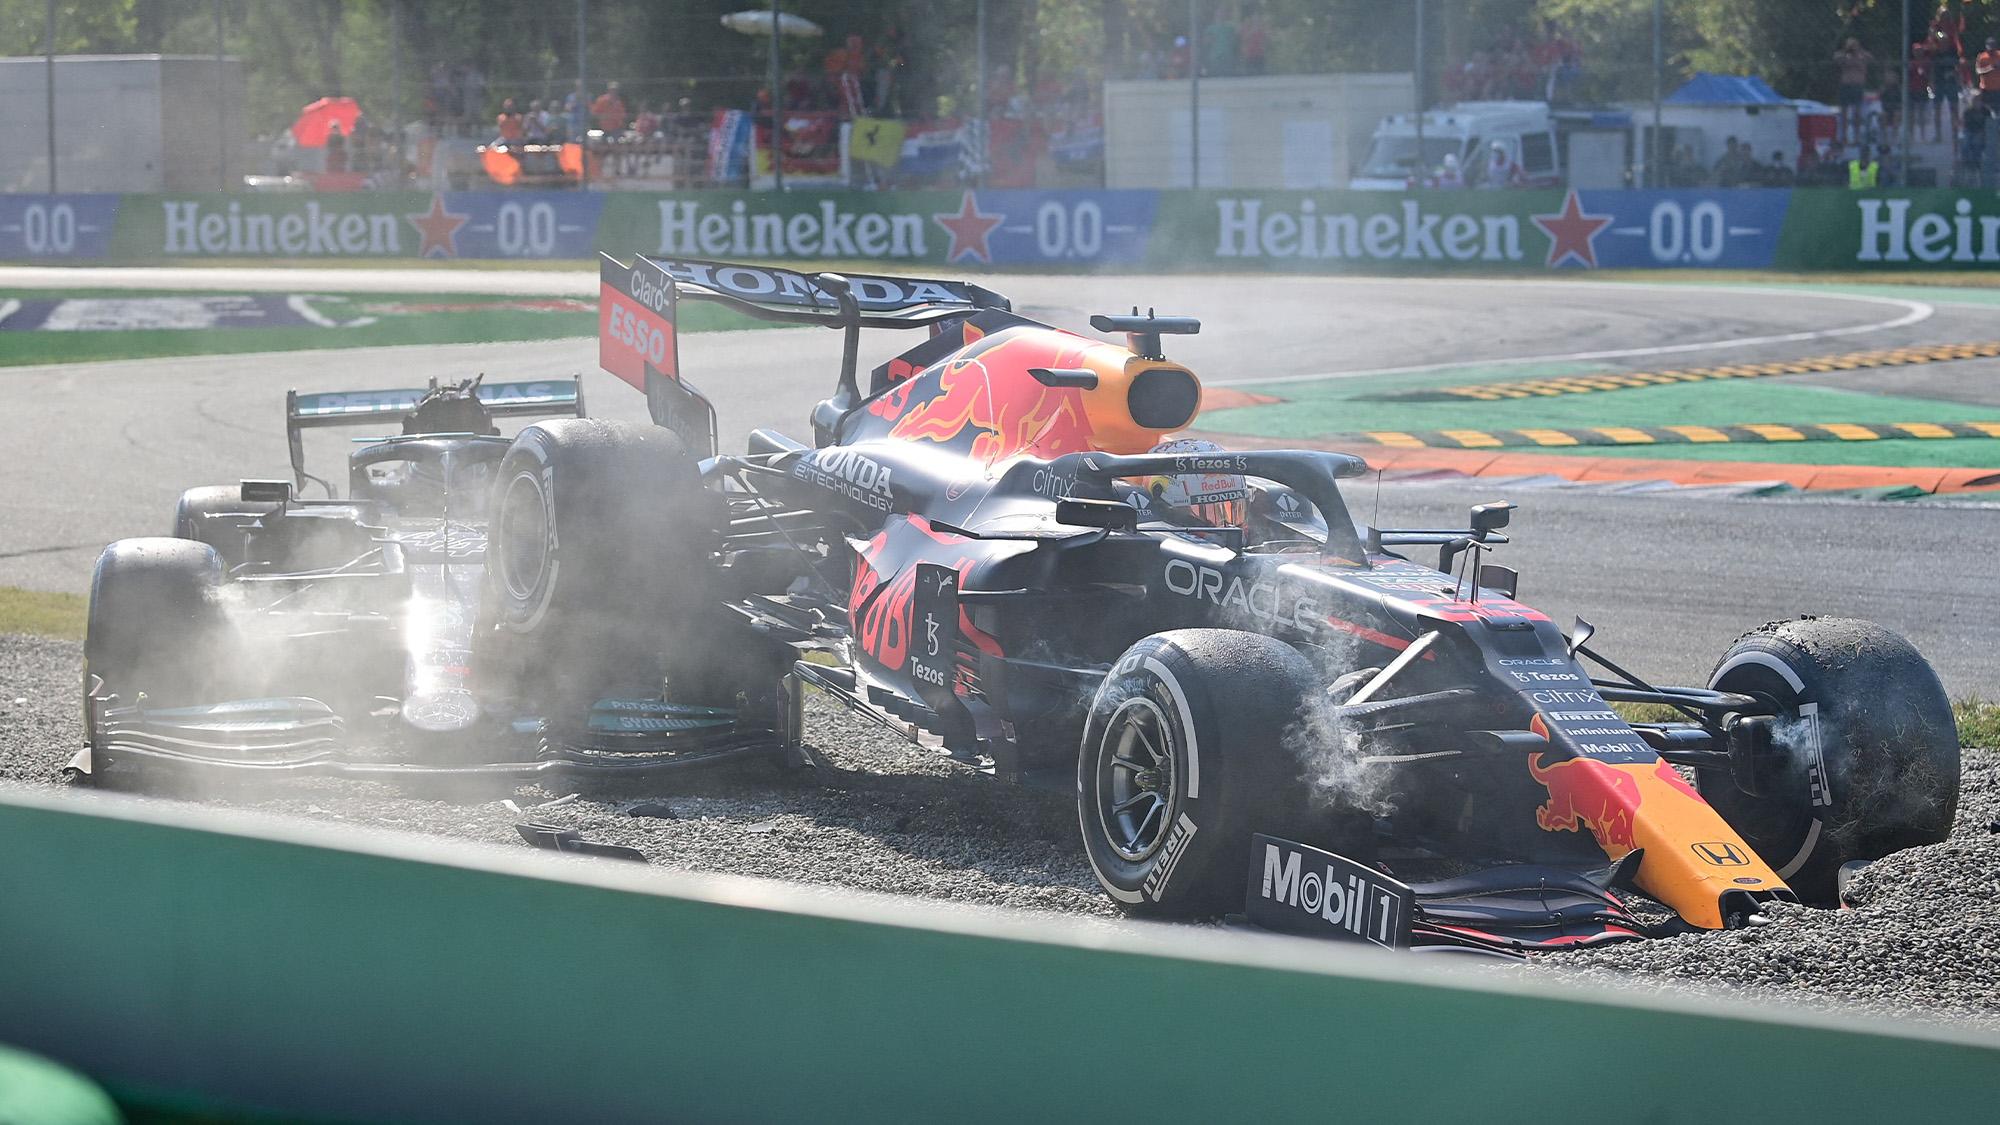 Lewis Hamilton and Max Verstappen crash at the 2021 Italian Grand Prix